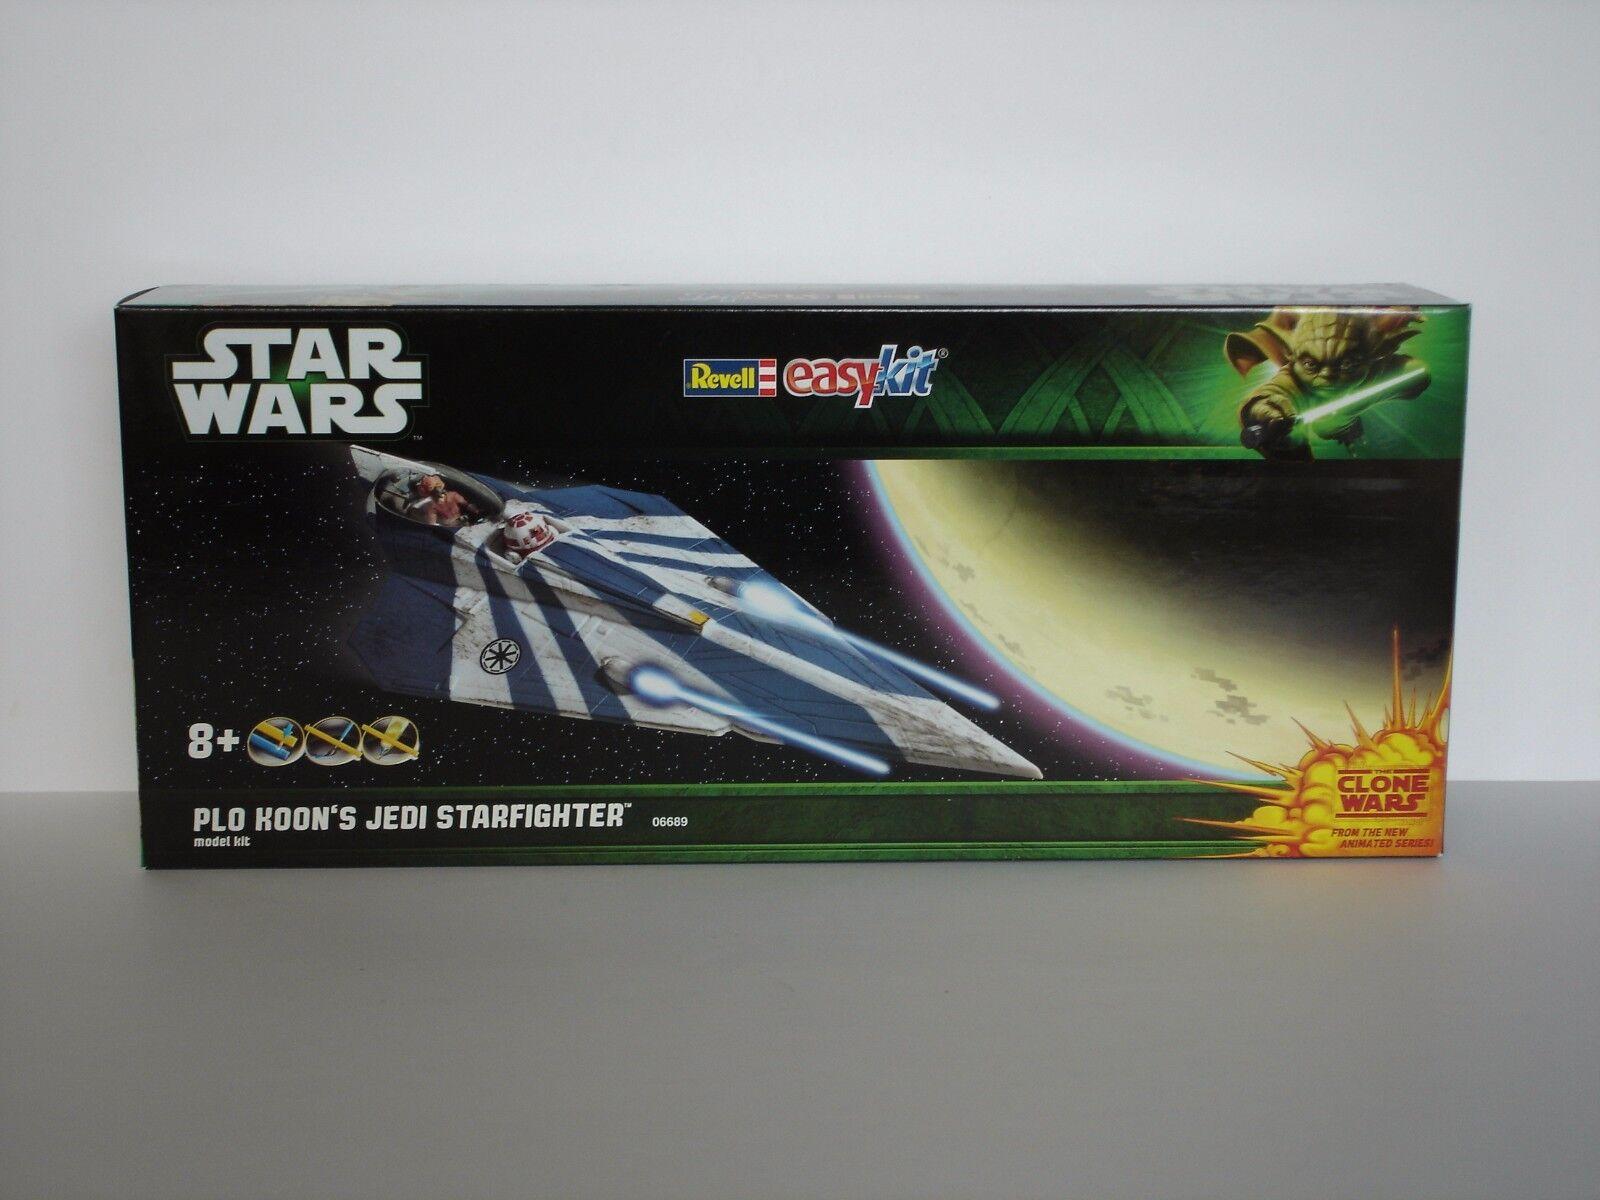 STAR WARS Plo Koon's Jedi Starfighter (Clone Wars) - Easykit - Revell 06689